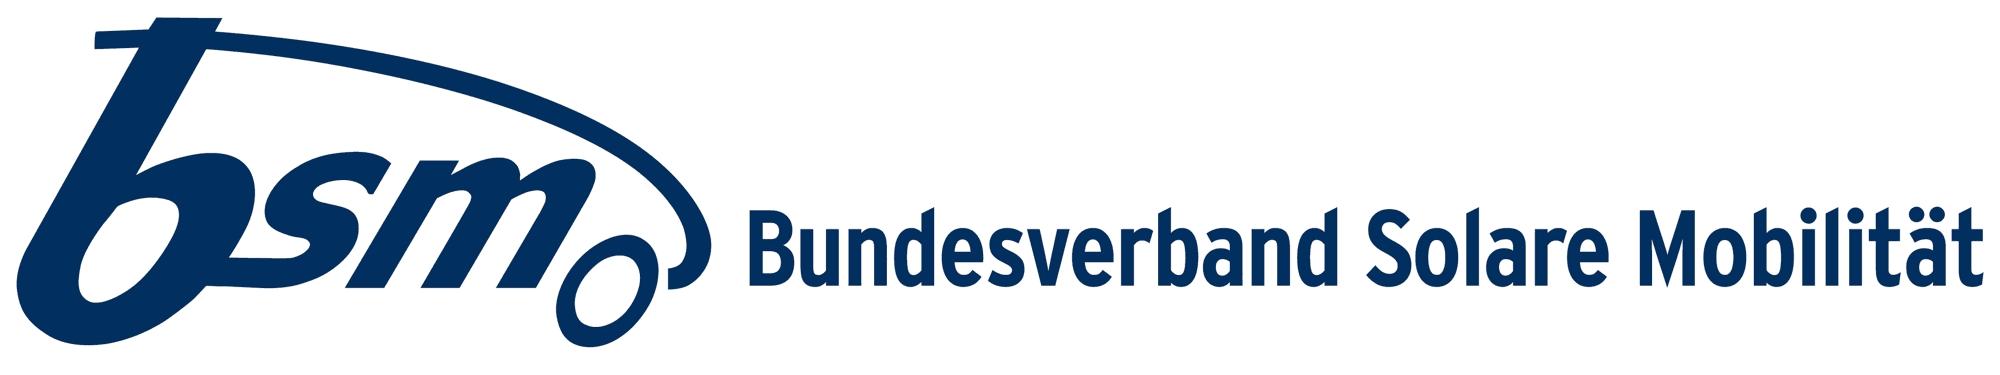 Bundesverband Solare Mobilität Berlin eV